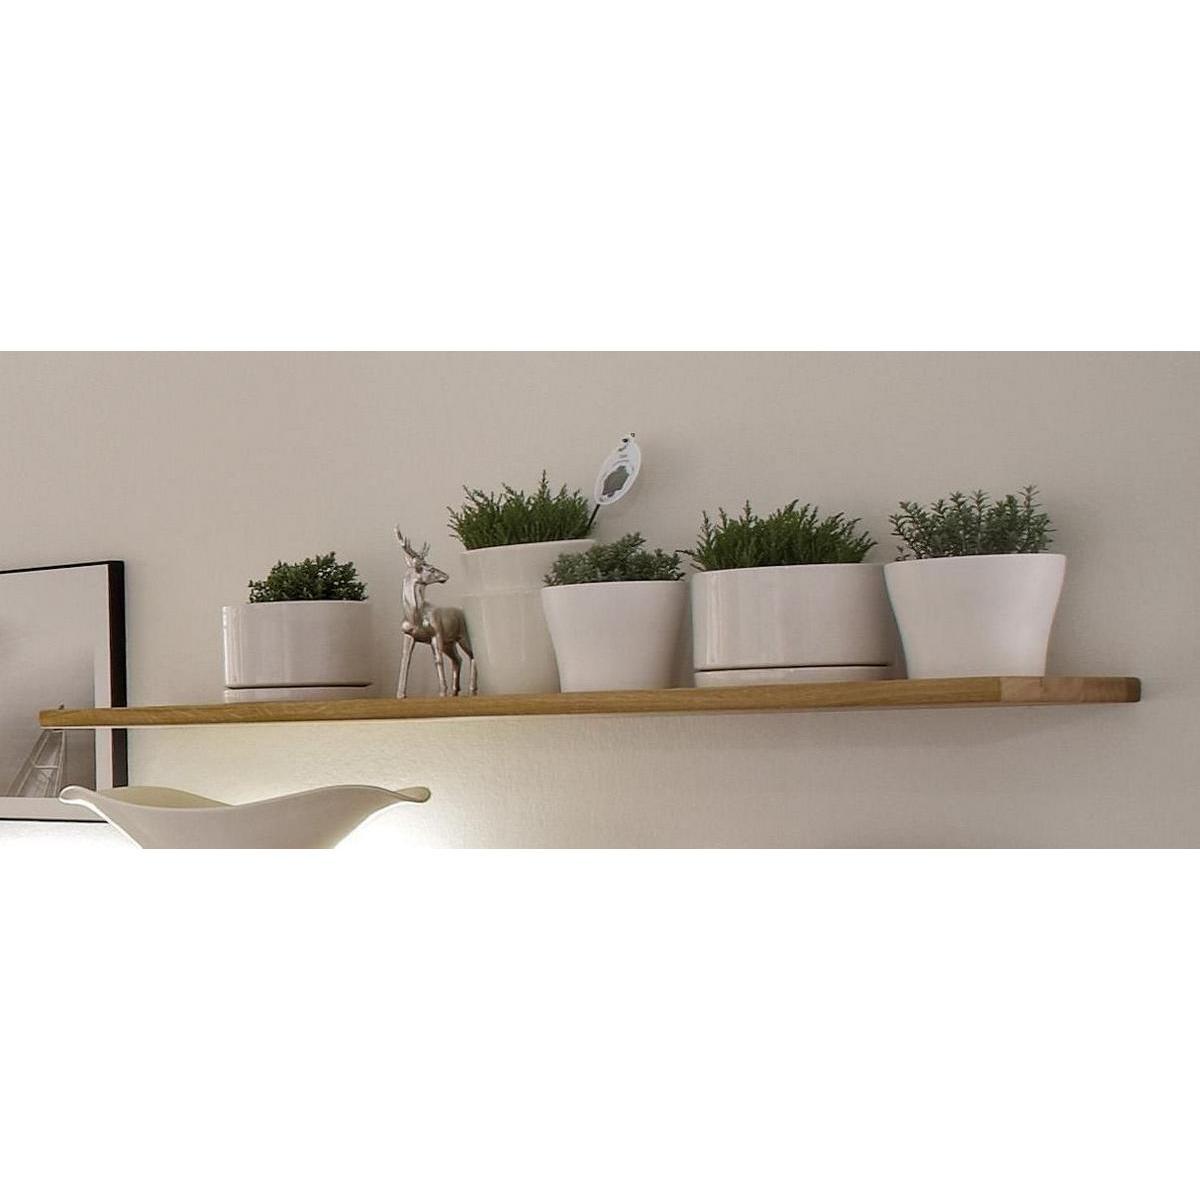 wandboard holz massiv perfect ikea wandregal wandboard massivholz x cm with wandboard holz. Black Bedroom Furniture Sets. Home Design Ideas